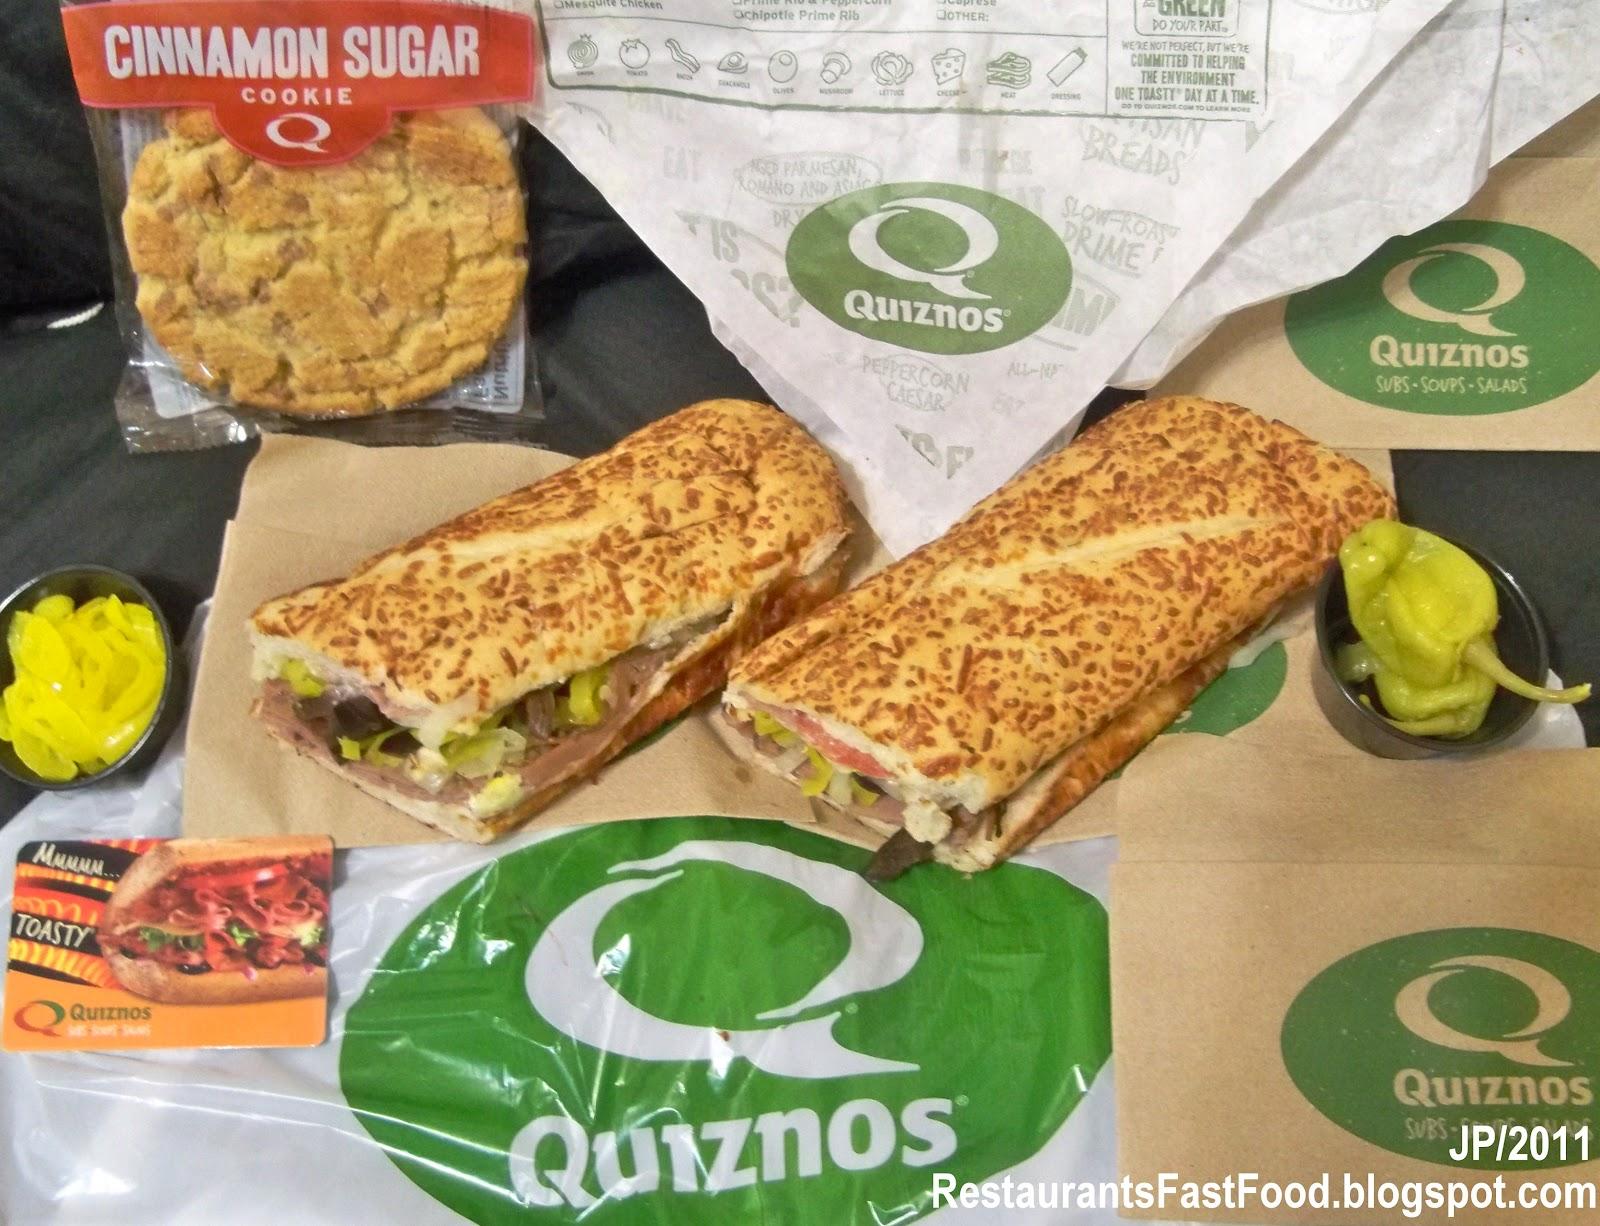 Quiznos Sandwich Shop Salt Lake City Utah Gift Card, Quiznos Fast Food Subs  Sandwich Shop Soups Salad Restaurant Slc Ut East Broadway